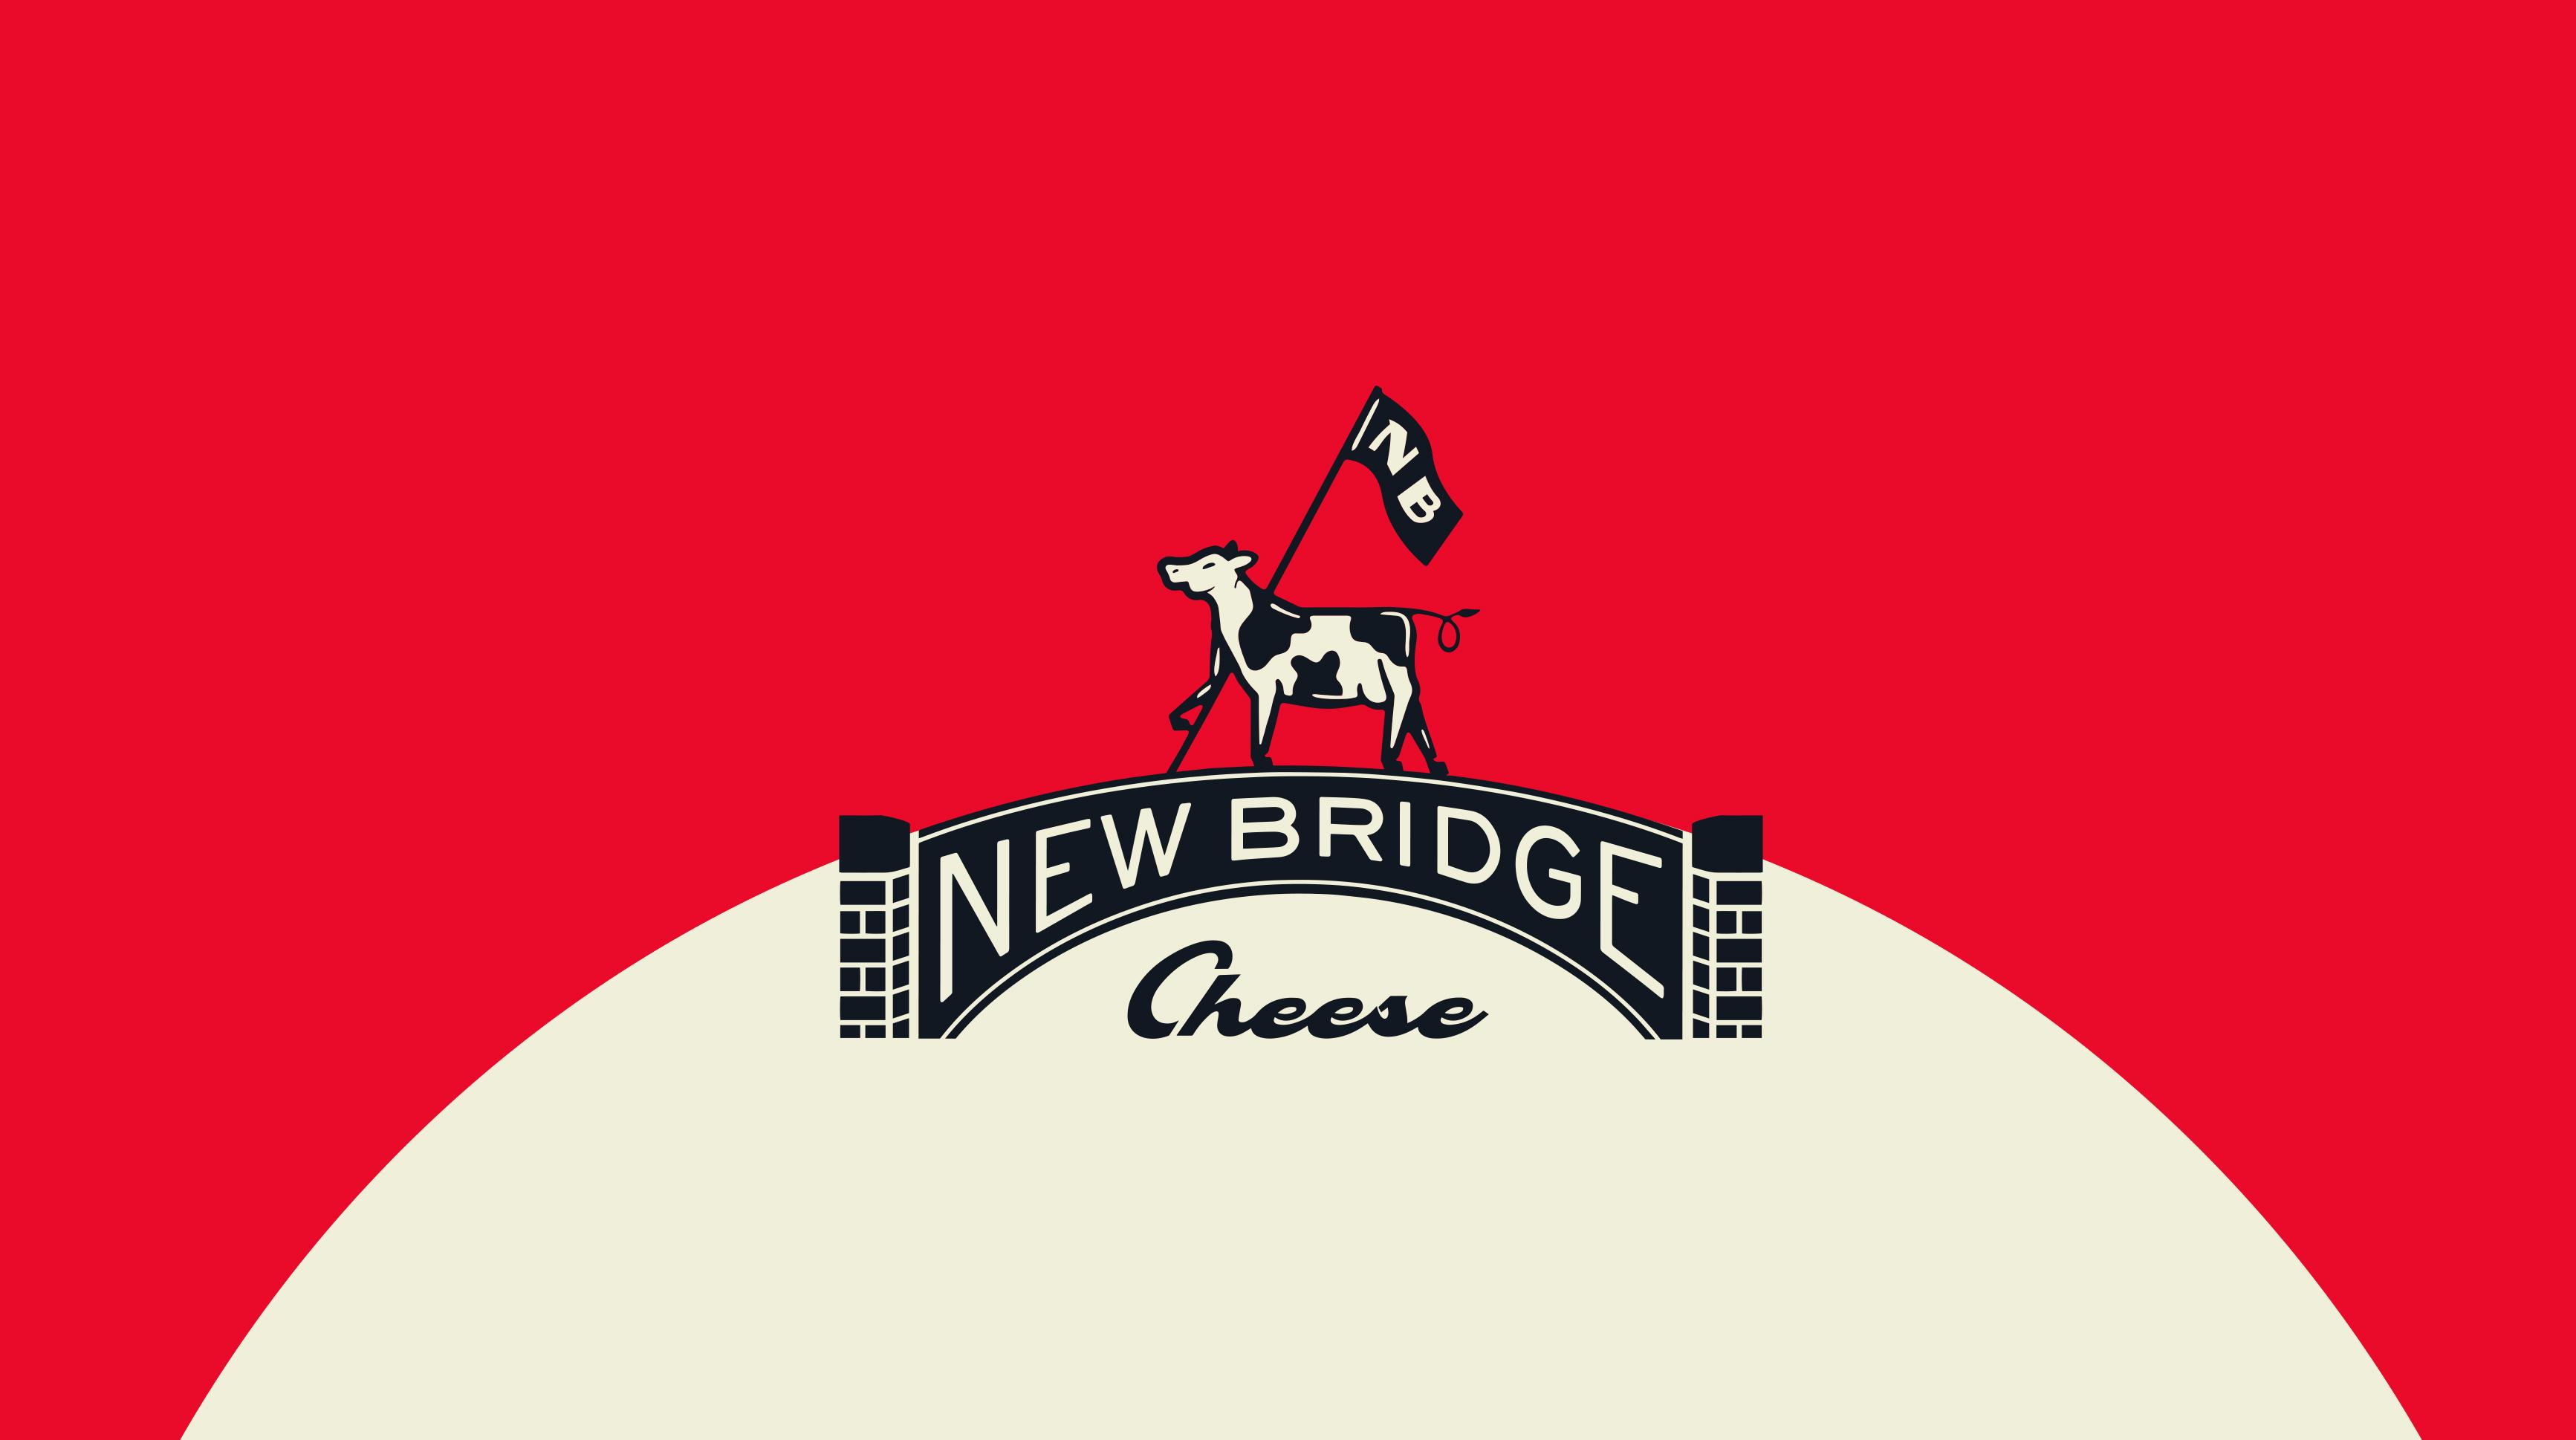 cow-proud-color-blocking-logo-new-bridge-cheese-design-exploration-zeki-michael-design-cheese-cow-spread-tub-sku-range-agency-branding copy